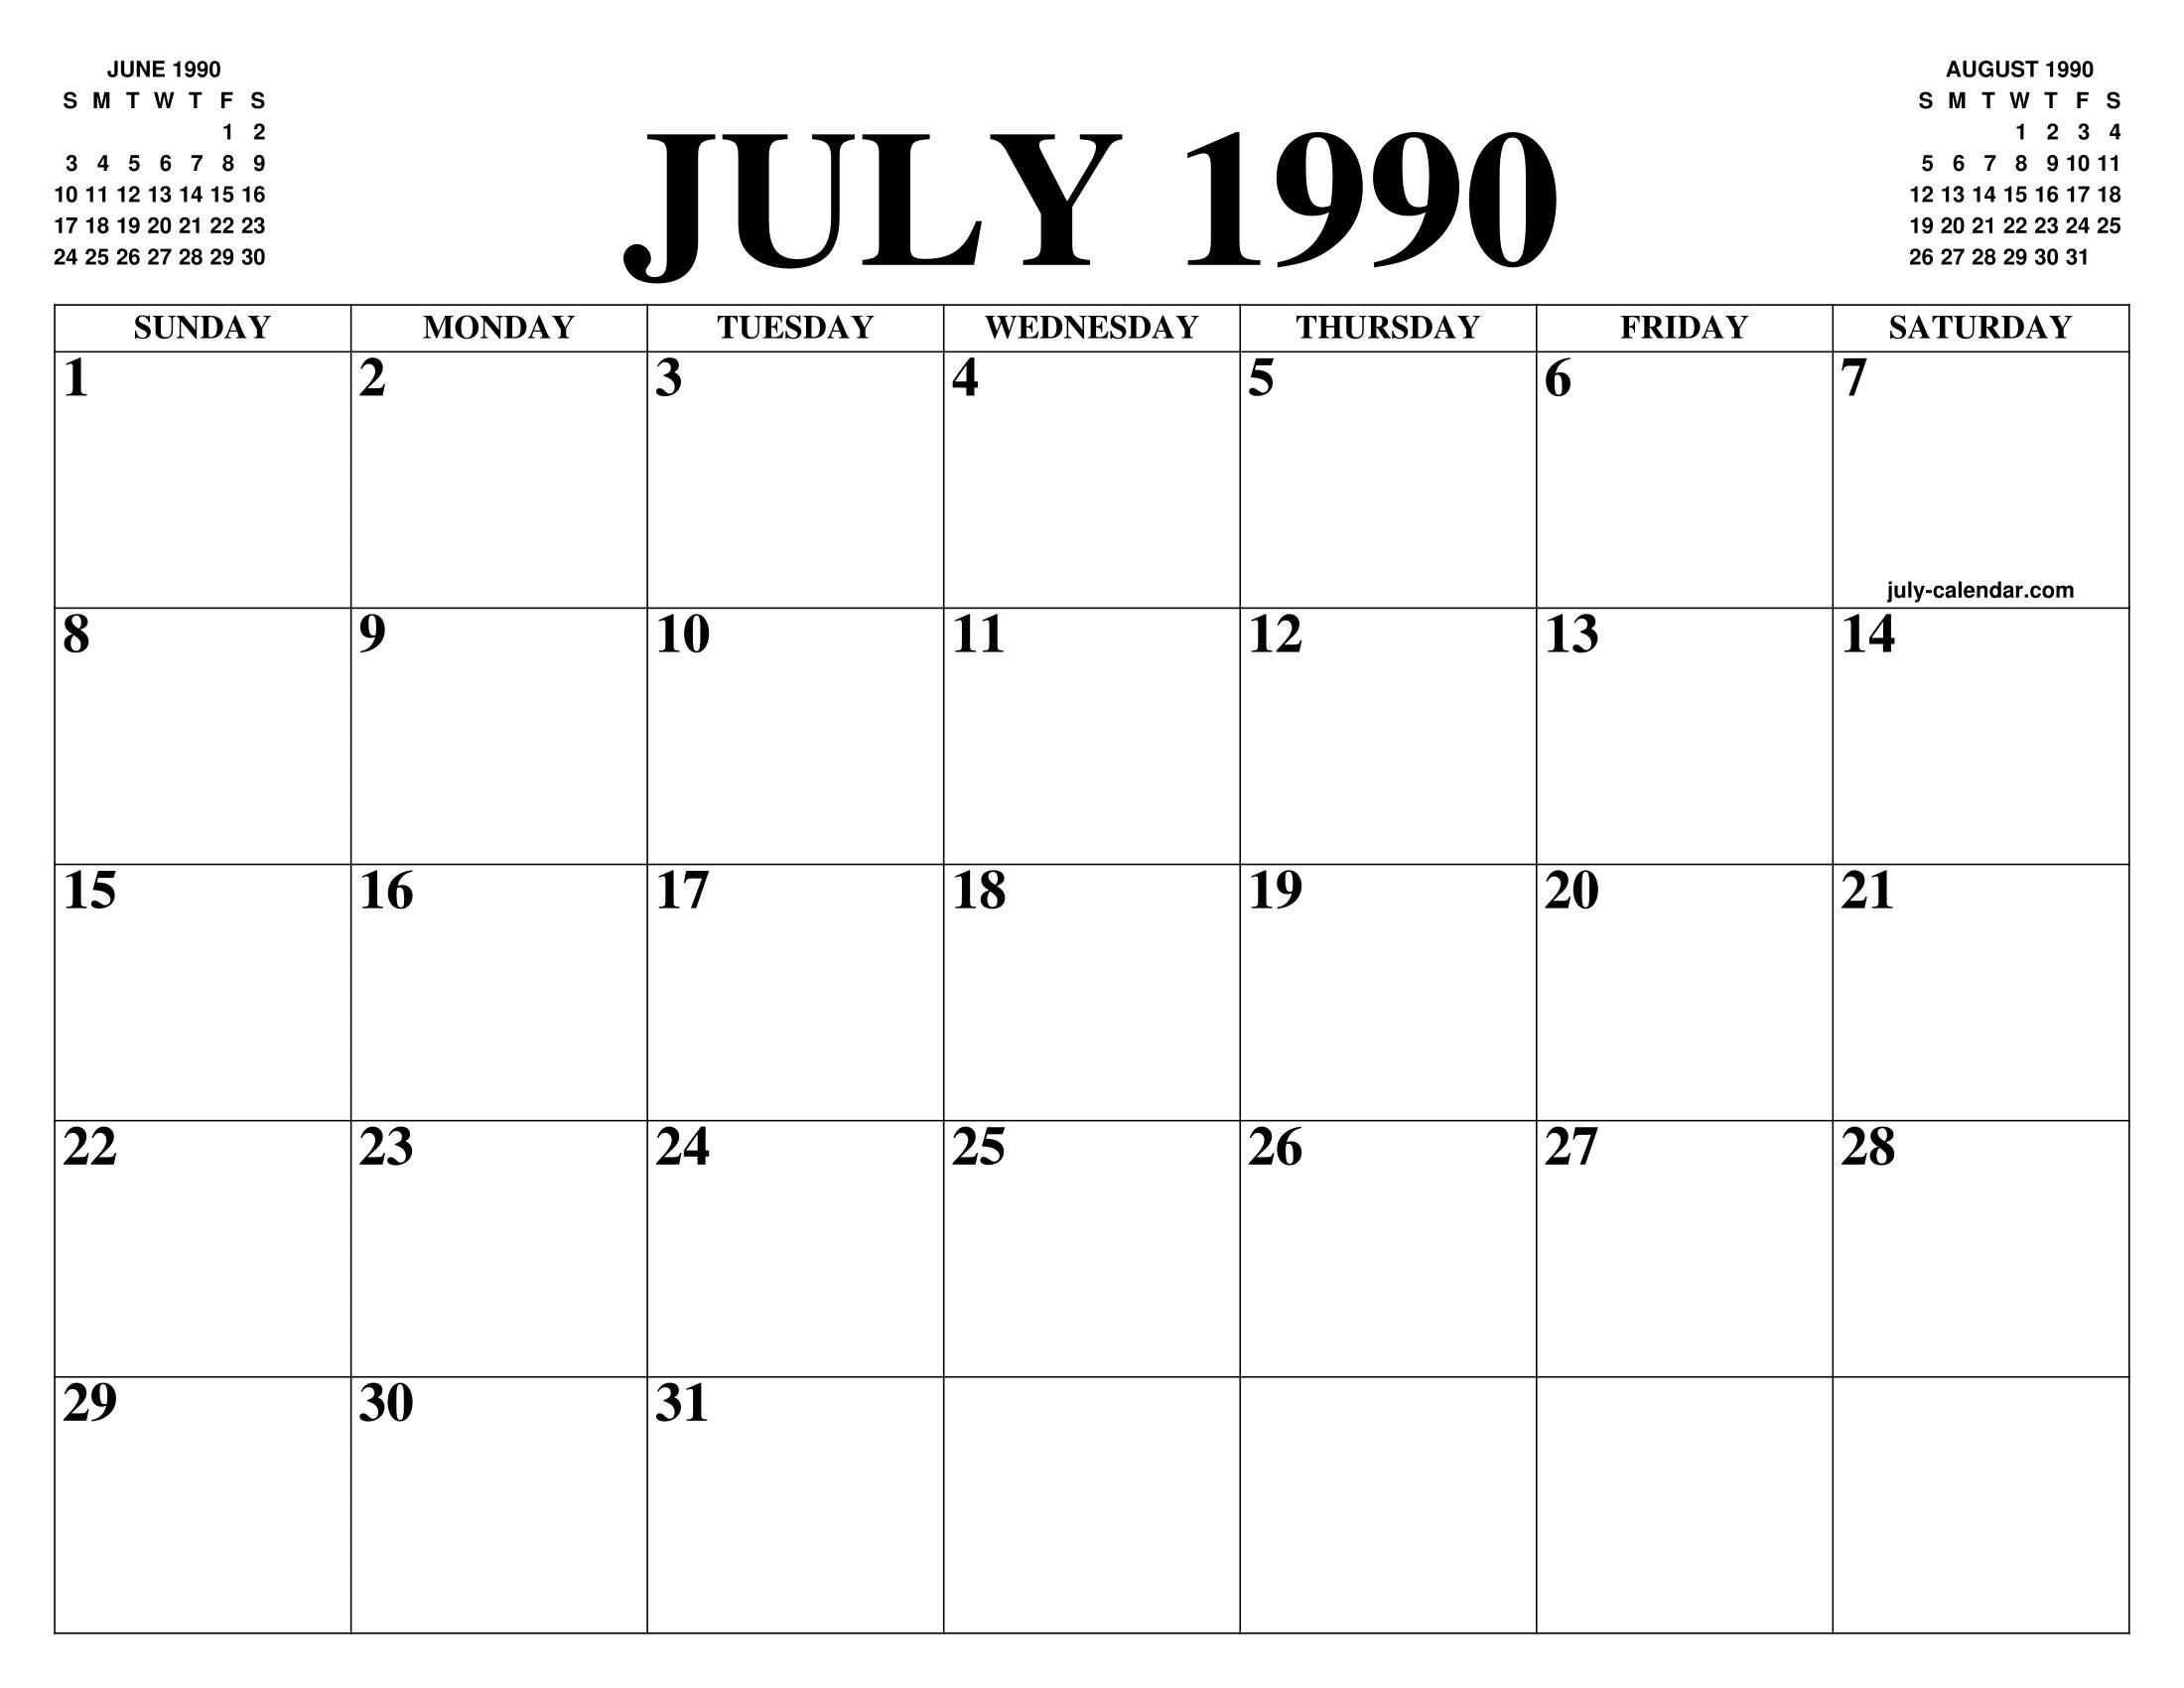 1990 Calendar.July 1990 Calendar Of The Month Free Printable July Calendar Of The